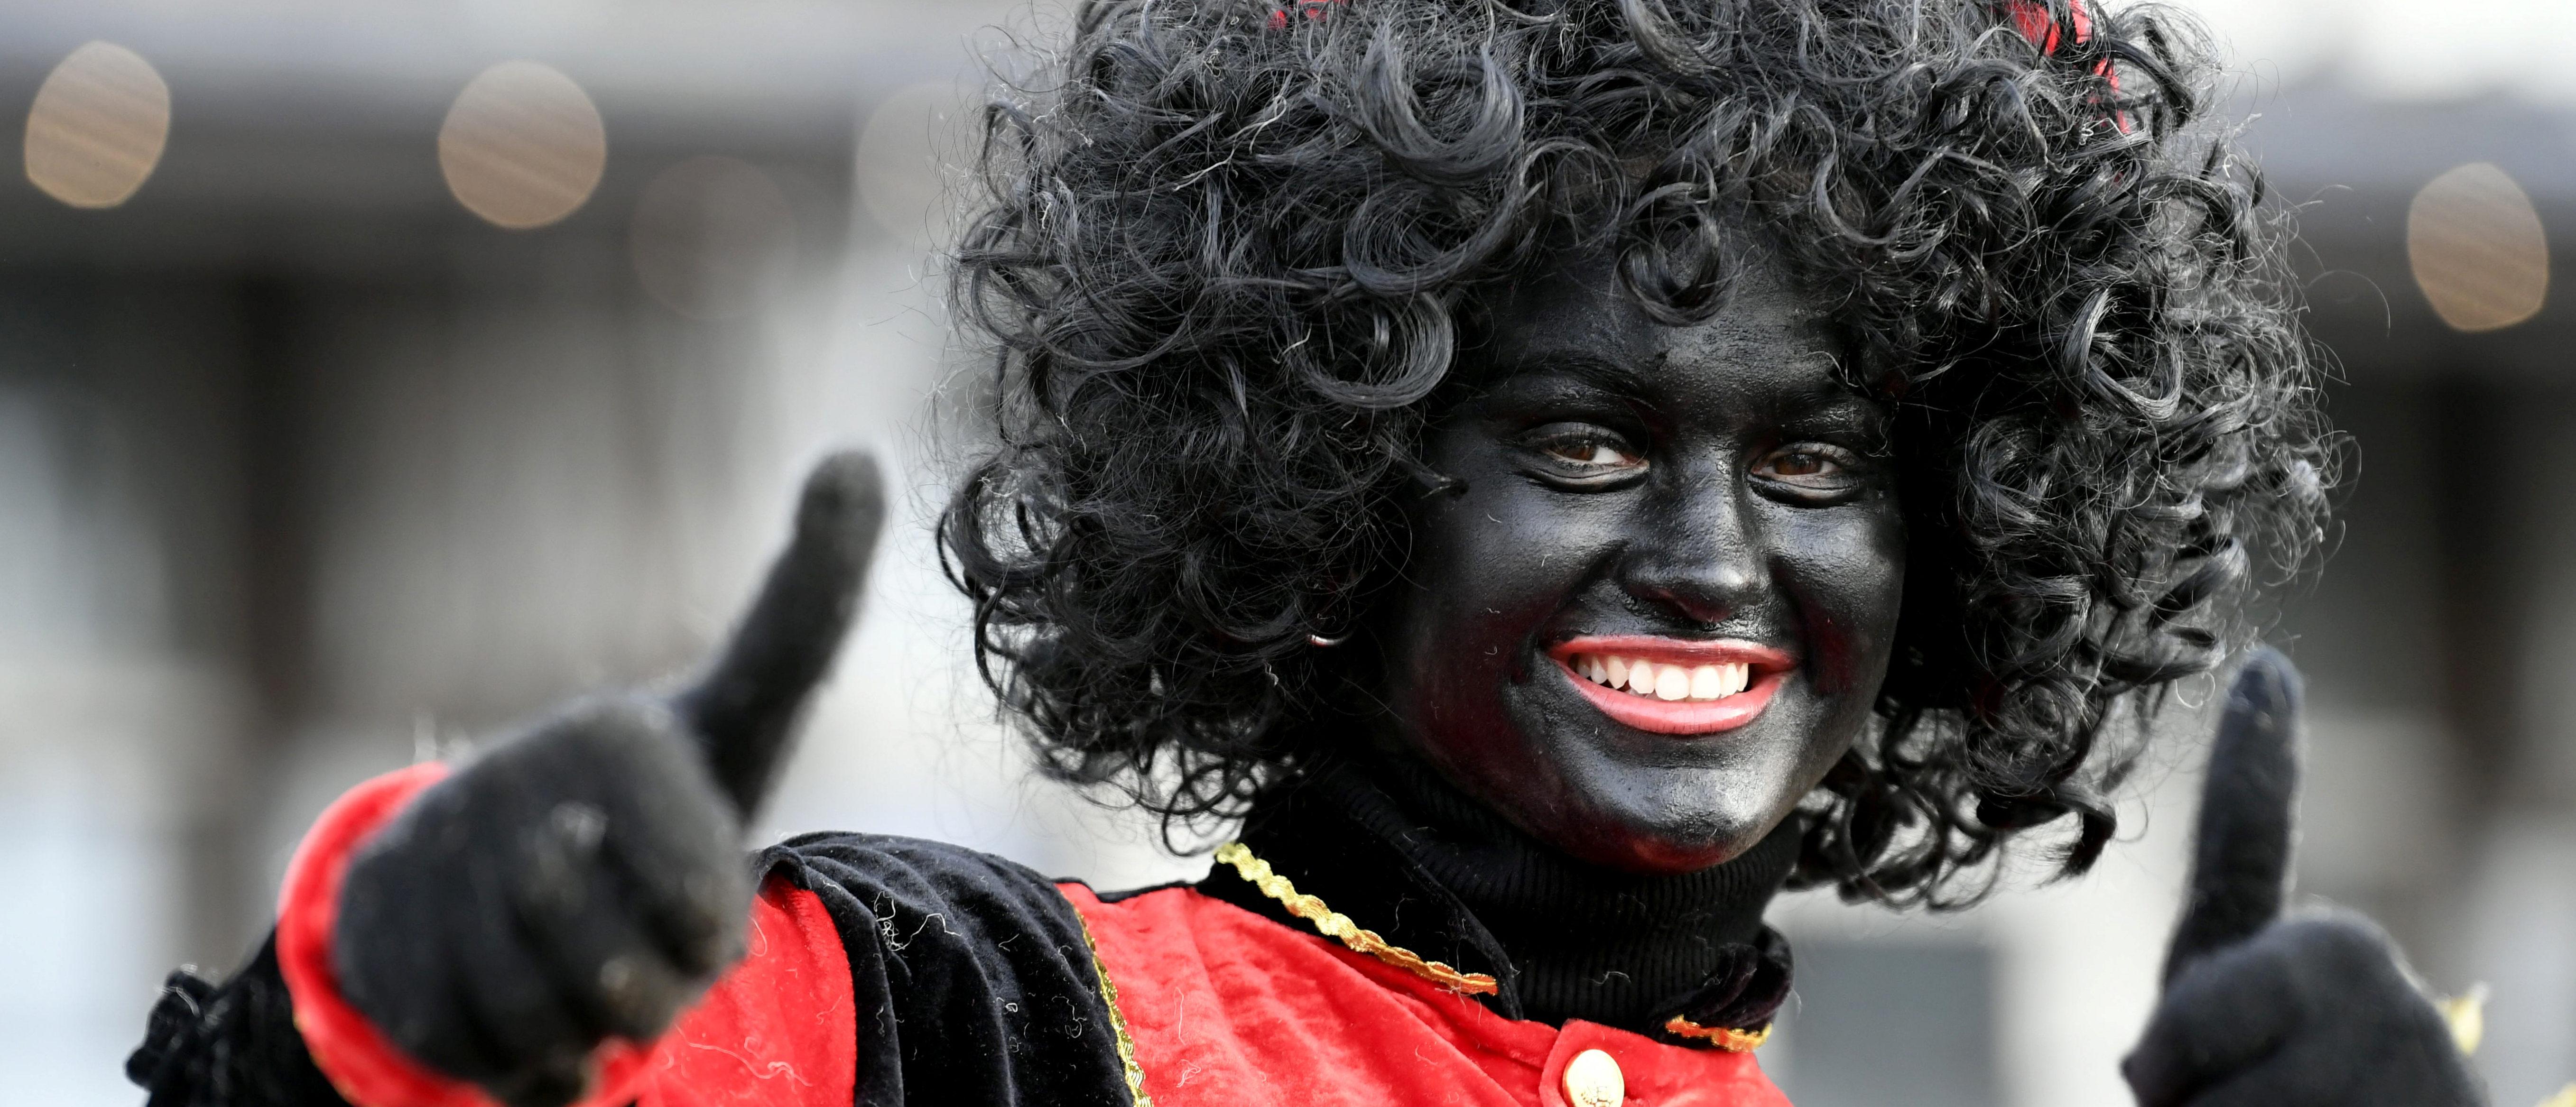 "An assistant of Saint Nicholas called ""Zwarte Piet"" (Black Pete) gestures as they arrive by boat at the harbour of Scheveningen, Netherlands, November 16, 2019. REUTERS/Piroschka van de Wouw - RC2BCD9I0ZSK"